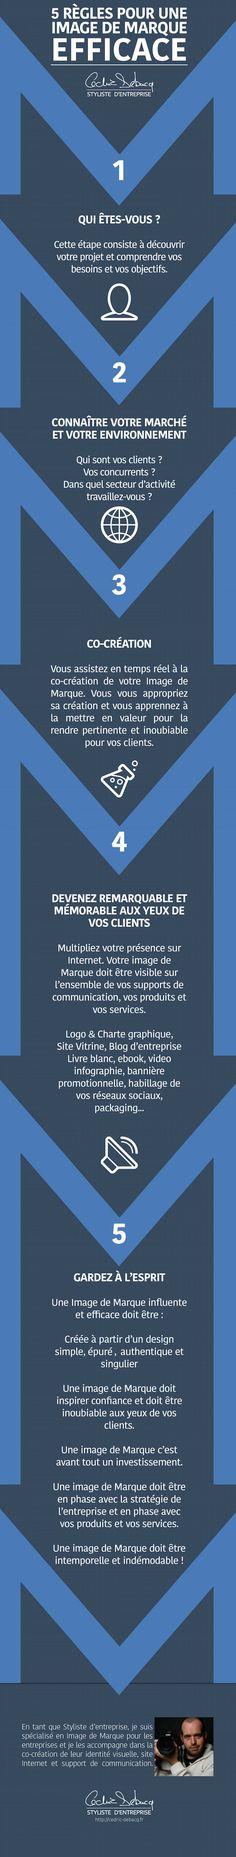 imageMarque-efficace Marketing Information, Marketing Data, Image Positive, Communication, Web Design, Client, Ui Inspiration, Community Manager, Business Branding